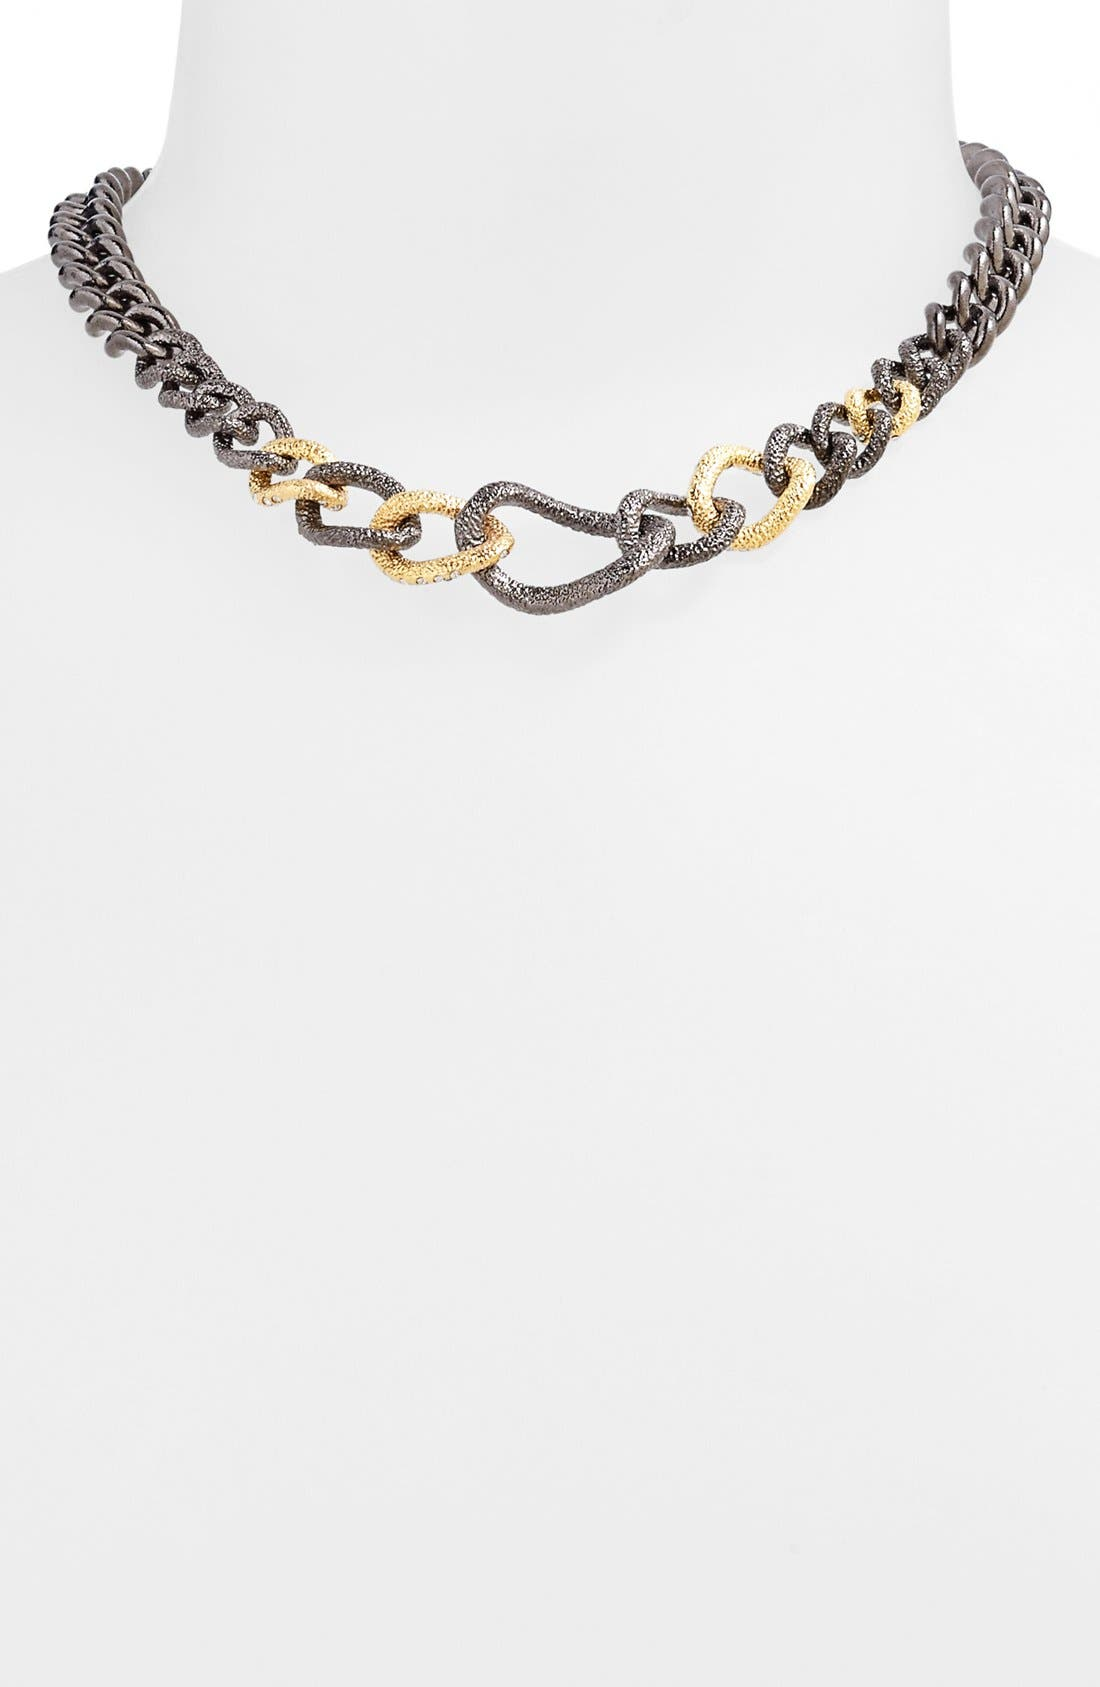 Main Image - Alexis Bittar 'Elements - Jardin de Papillon' Link Collar Necklace